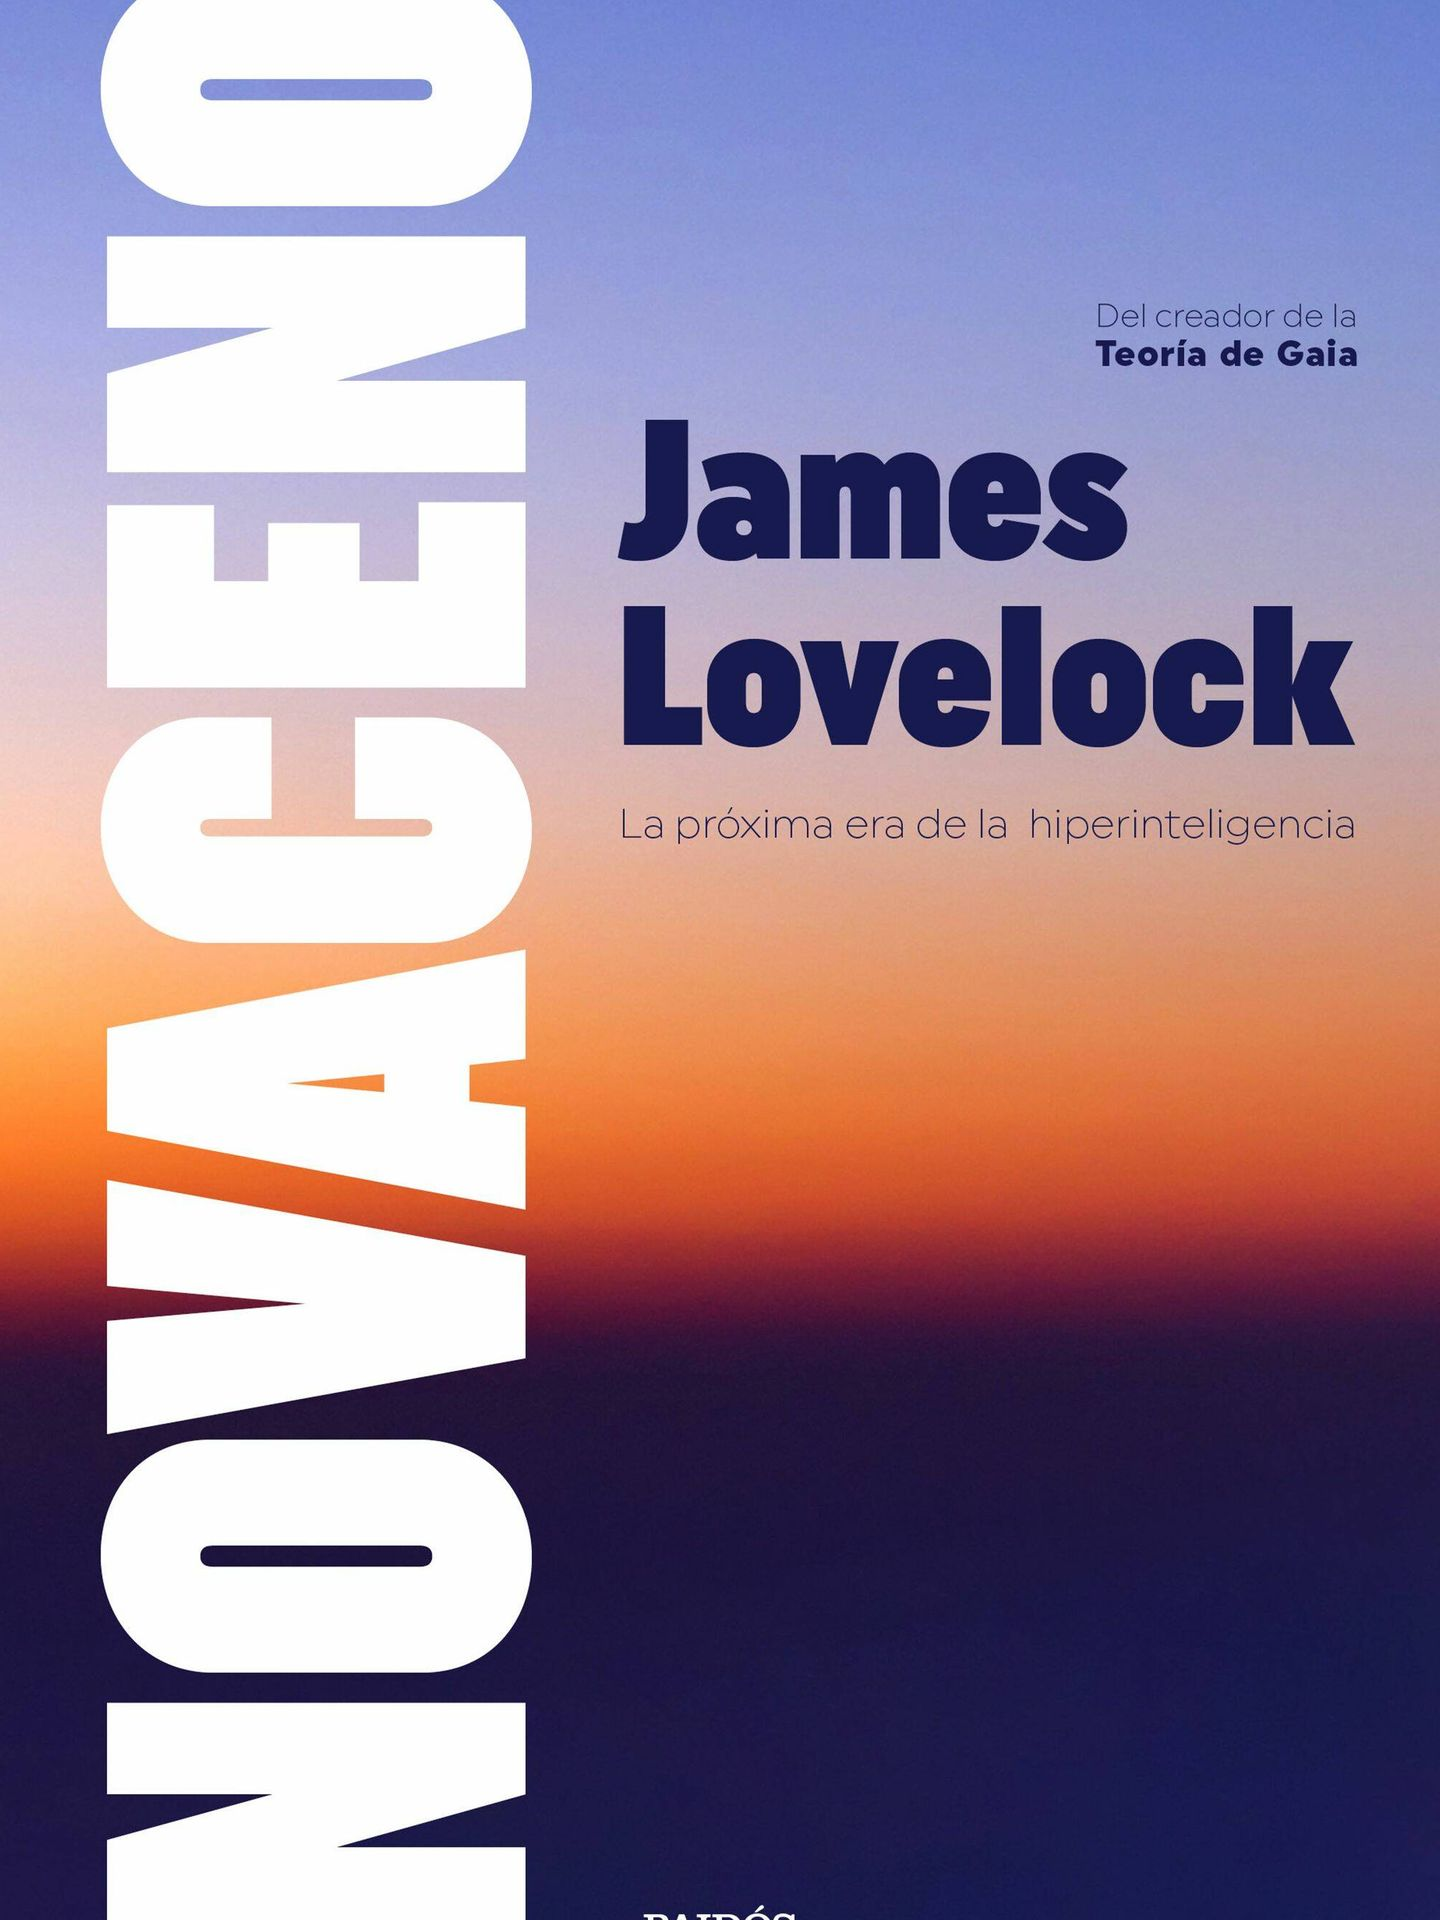 Lovelock asegura que humanos y cíborgs conviviremos en paz. (Paidós)